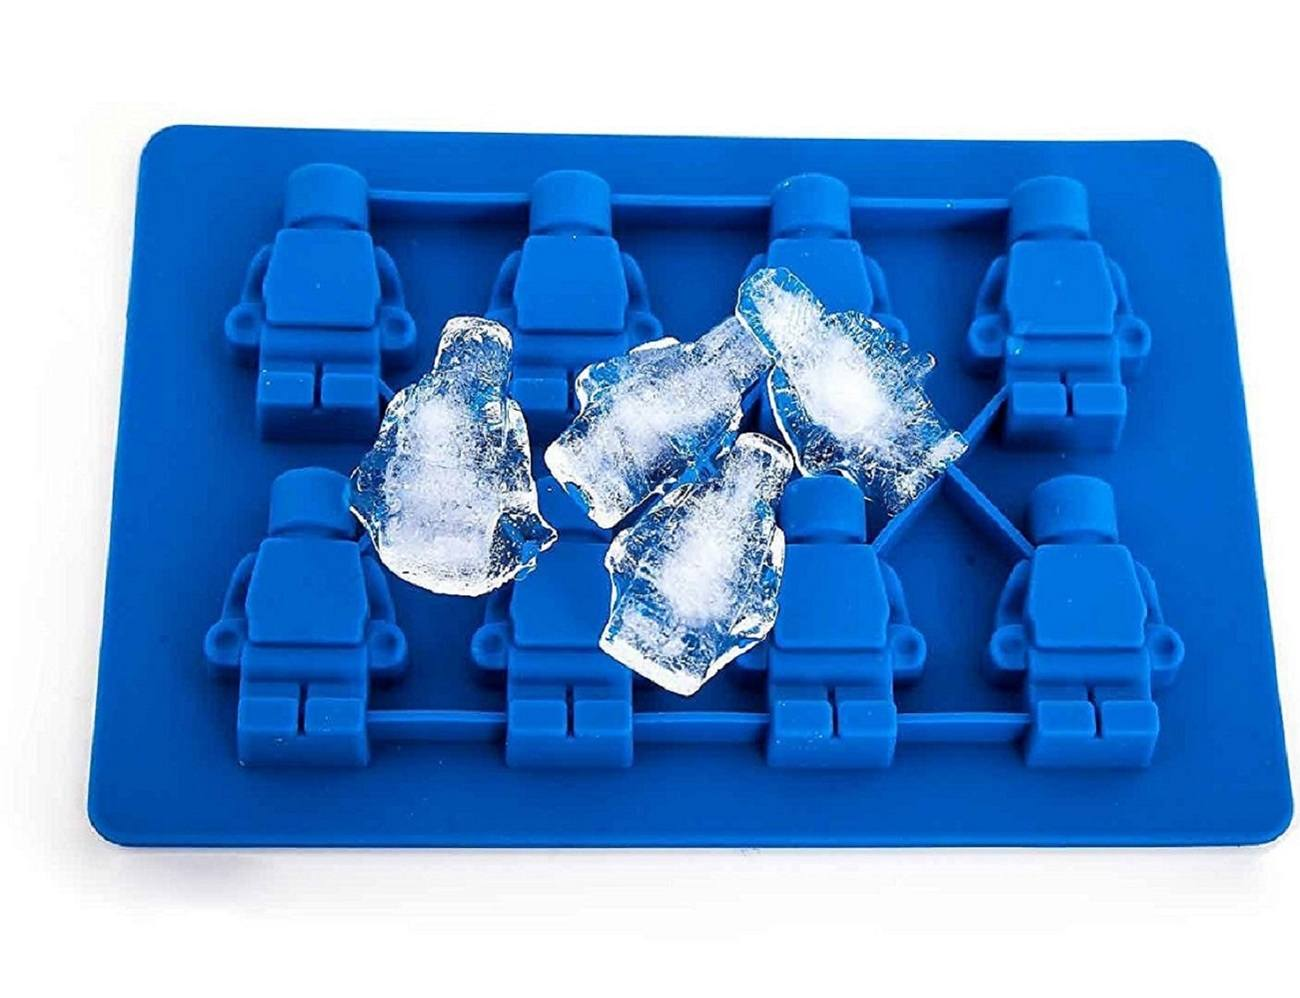 Lego Man Ice Cube